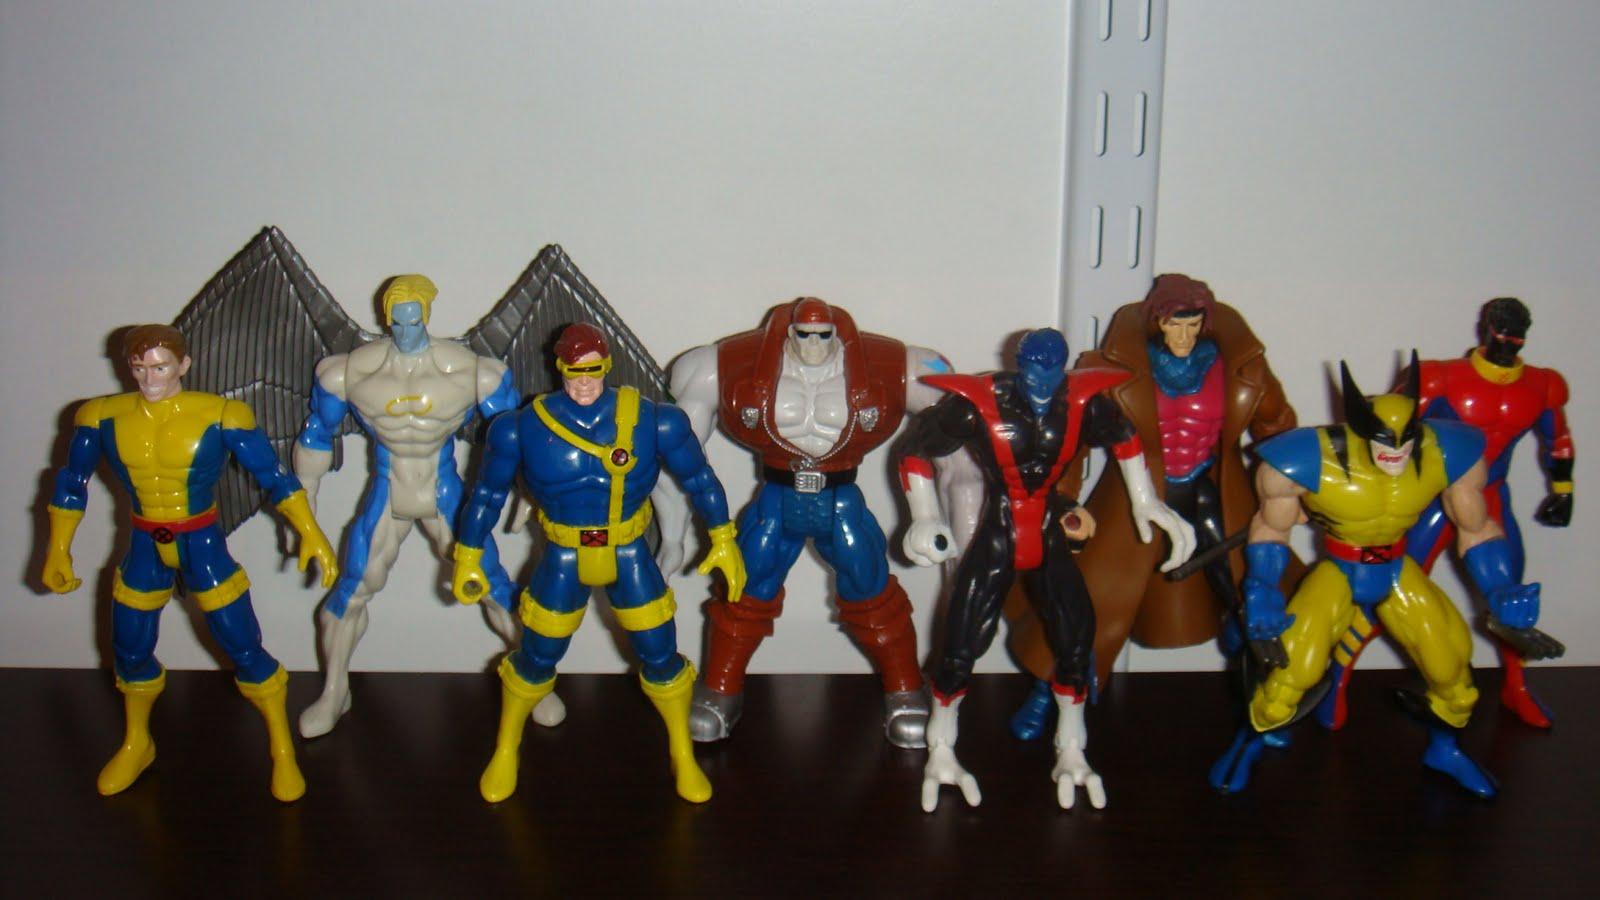 Xmen action fig... X Men 2 Action Figures